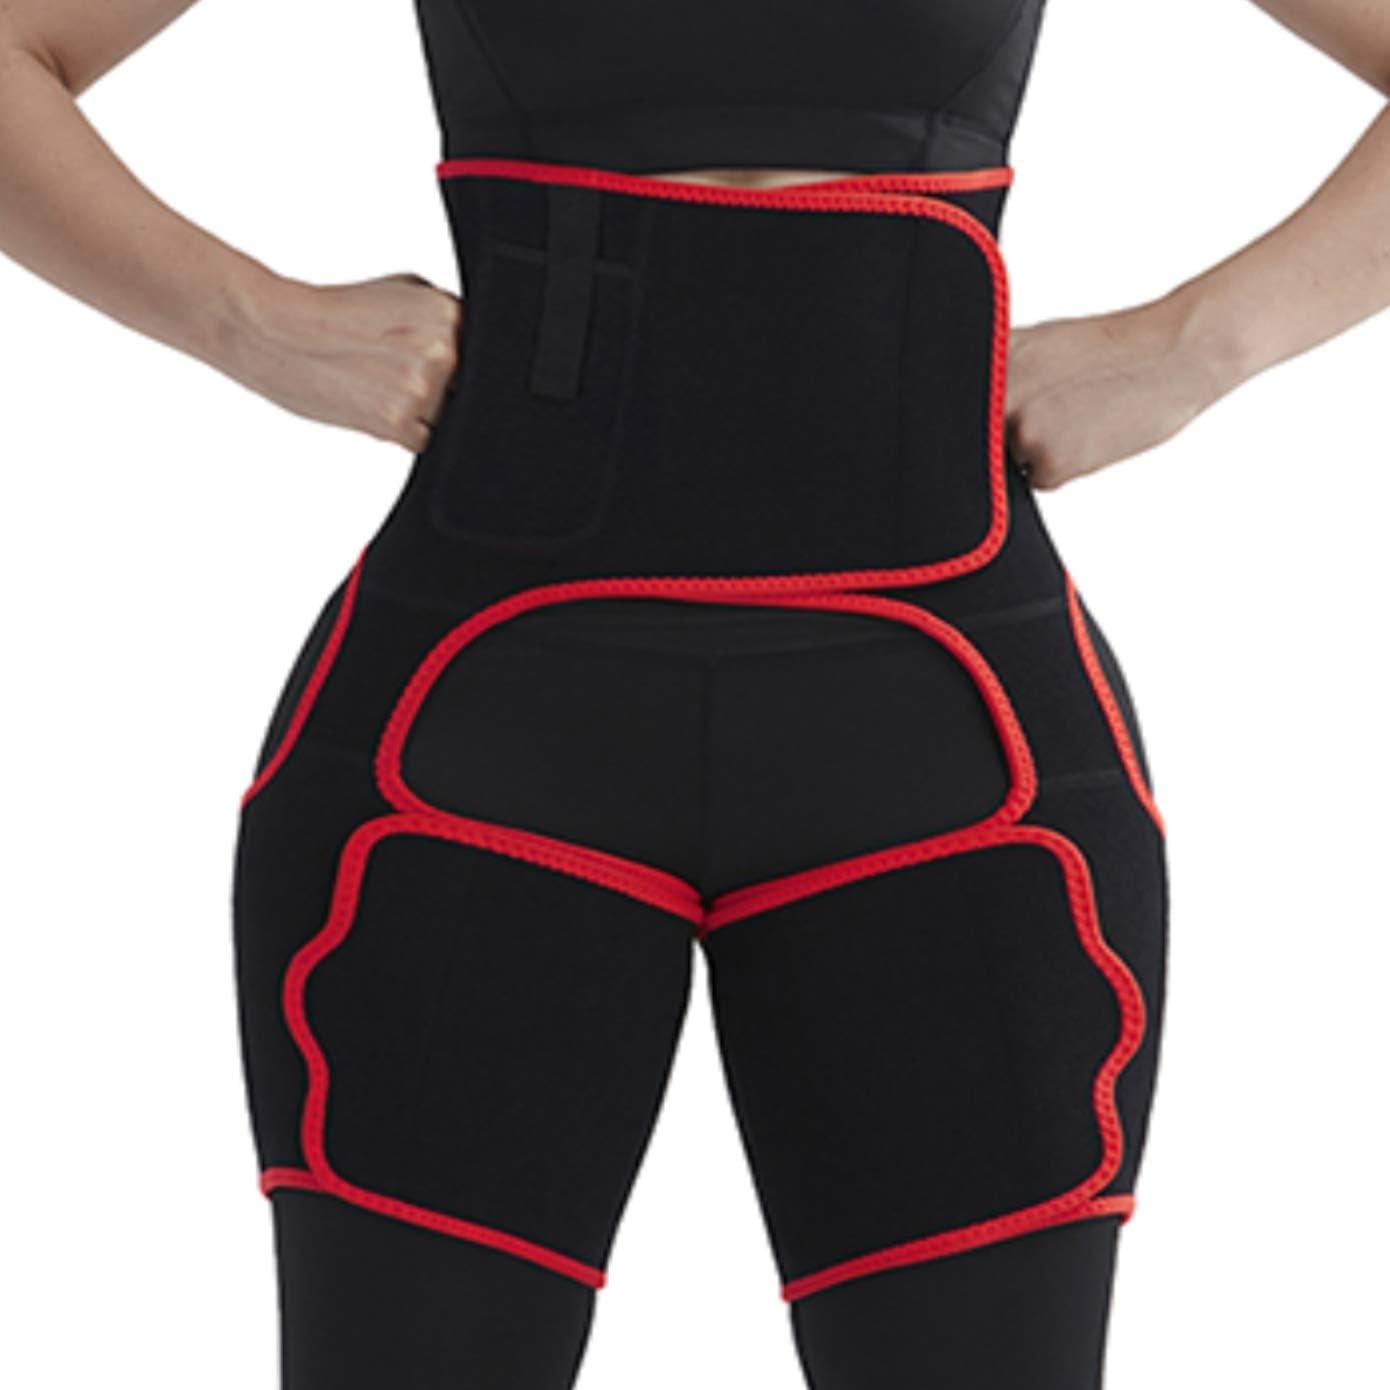 Wonder-Beauty Women's Sauna Sweat Waist Trimmer and Butt Lift Thigh Trimmer with Phone Pocket for Workout Weight Loss